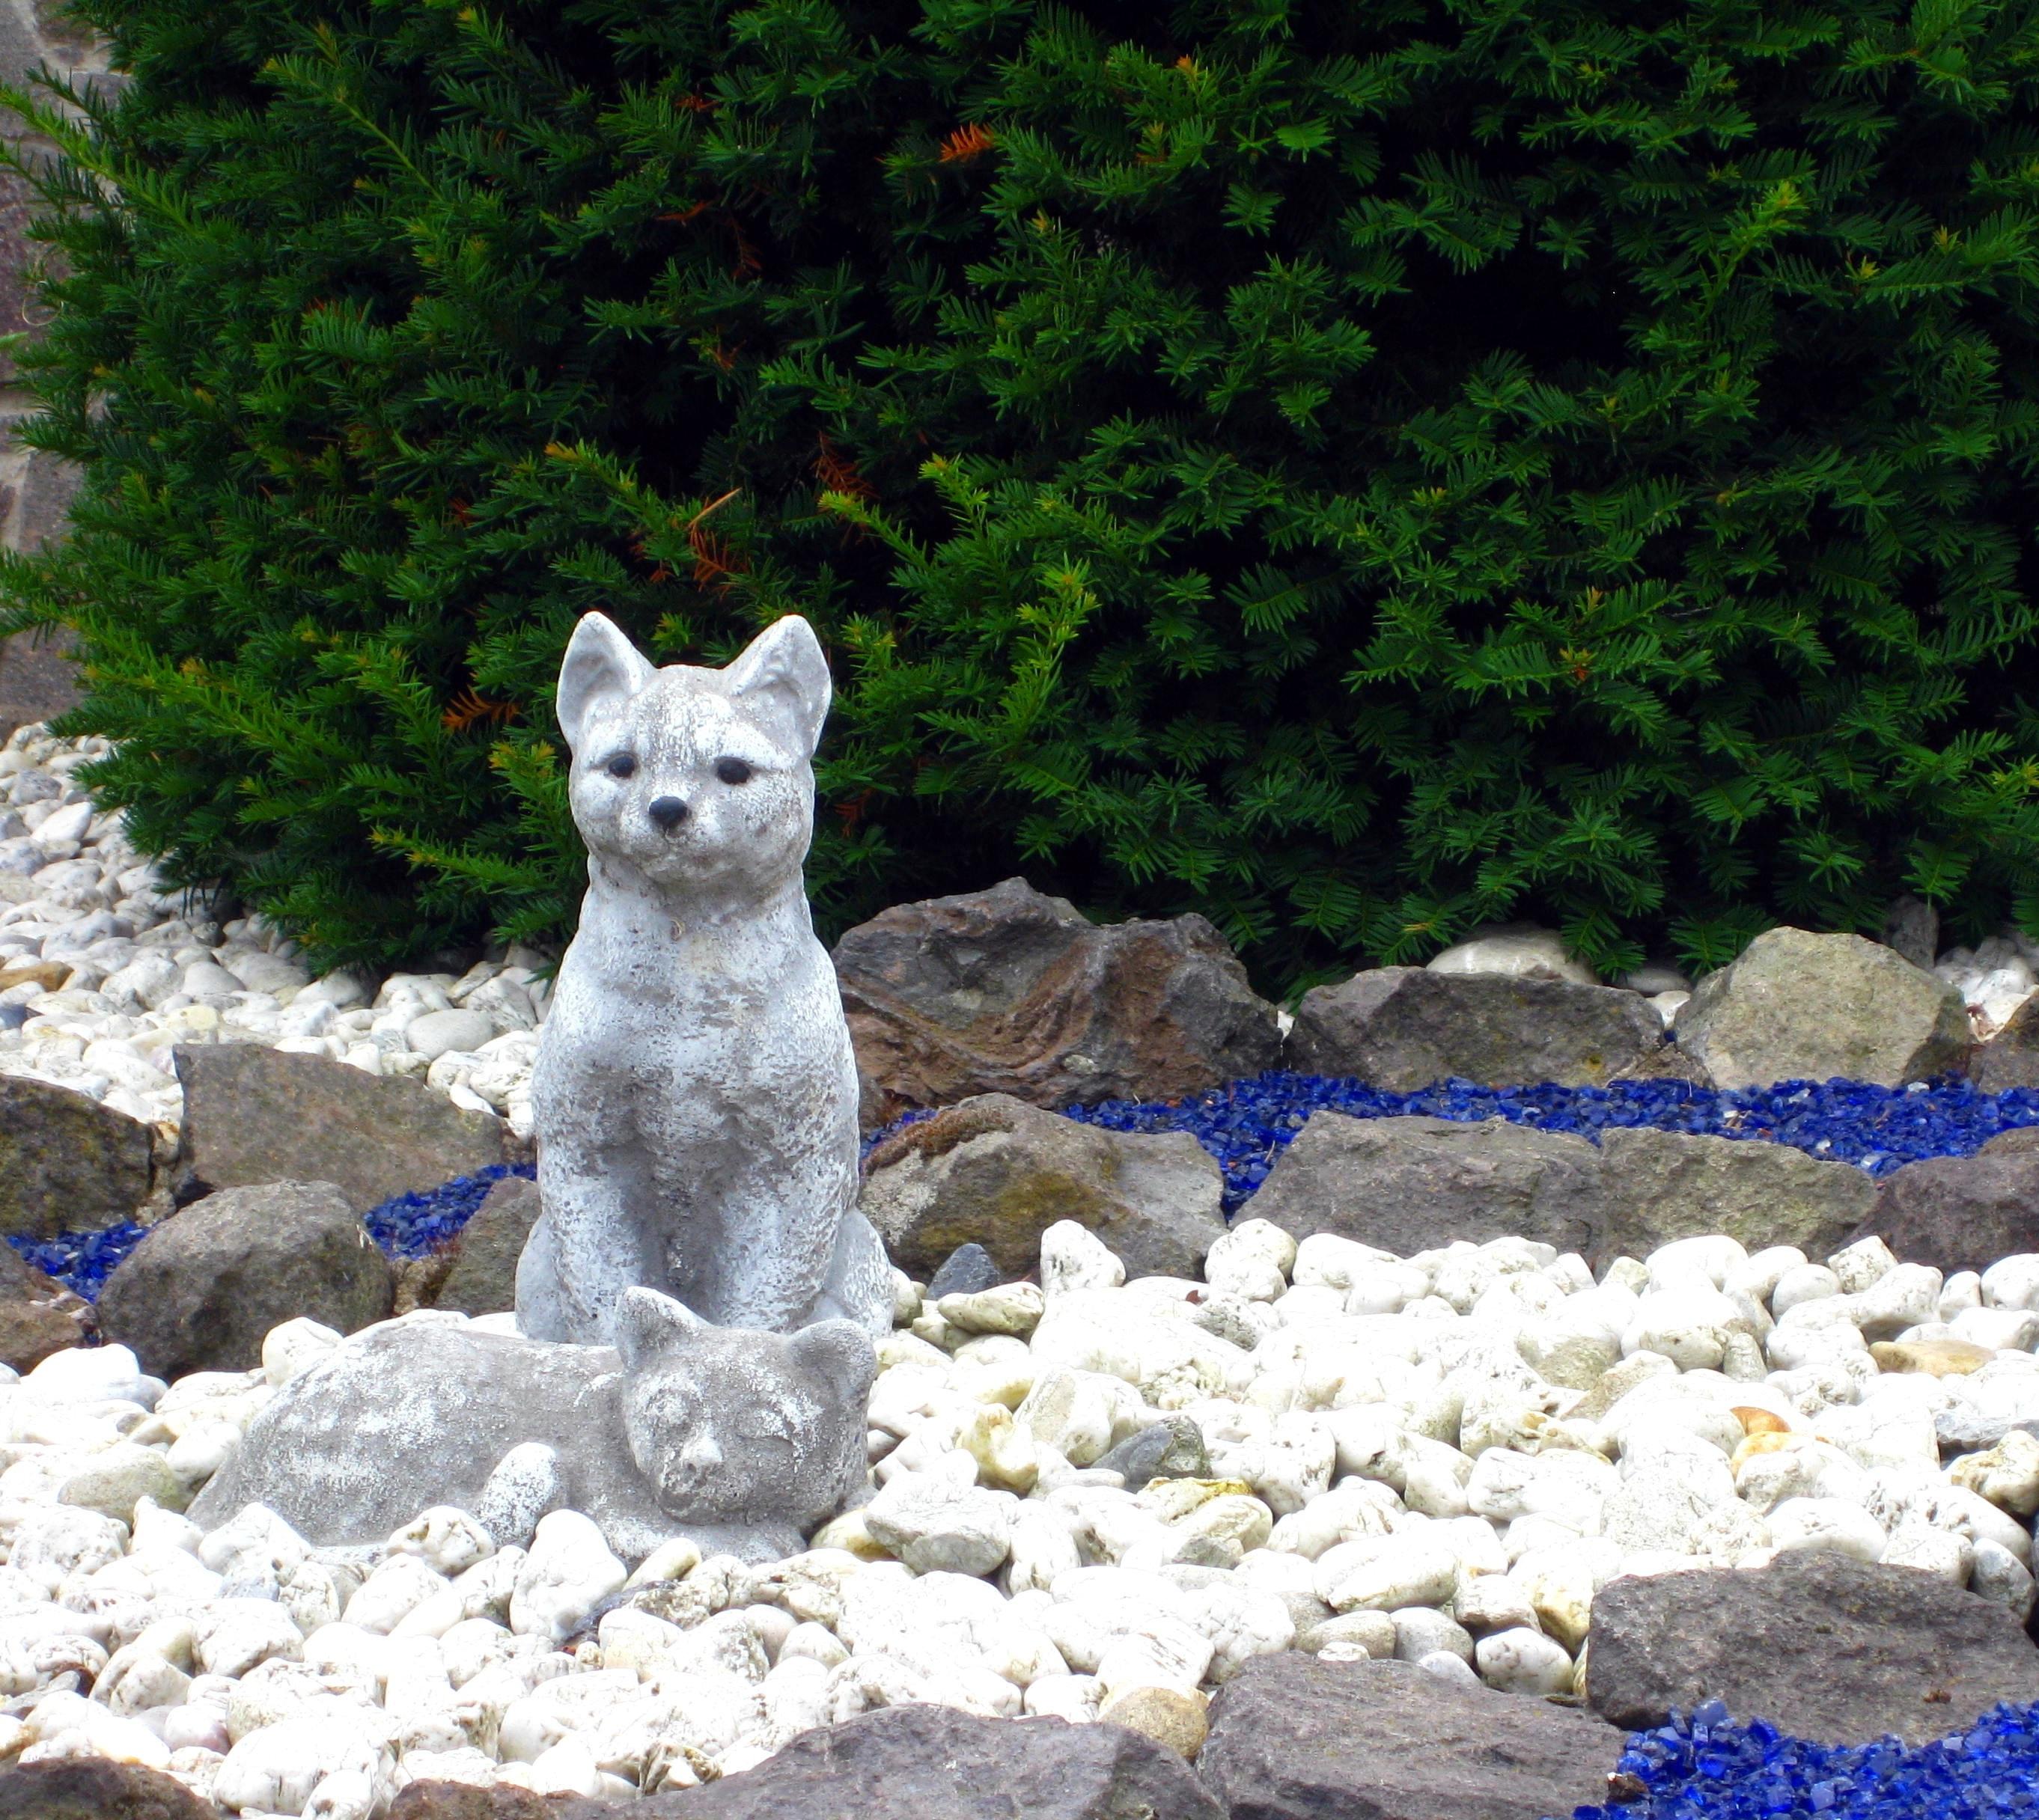 Gratis billeder : hvid, Zoo, kat, siddende, pattedyr, sten, grus ...